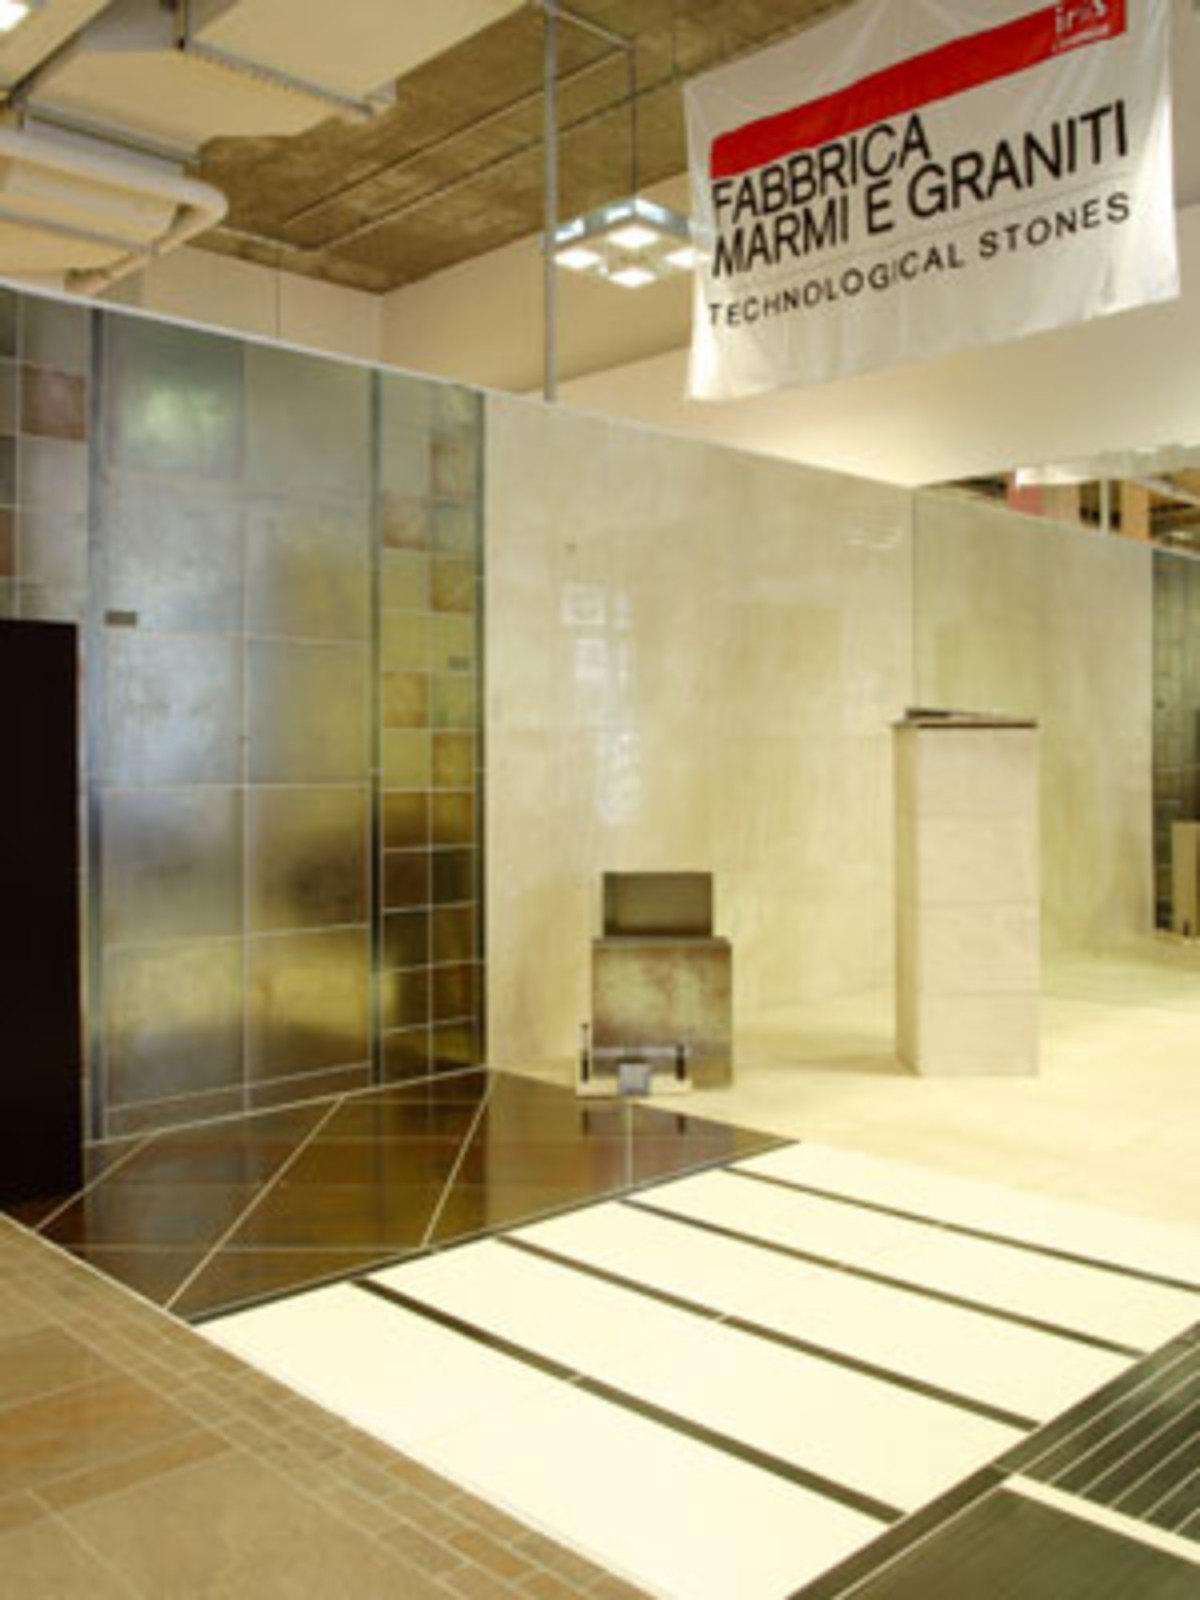 Iris Ceramica and Iris Fabbrica Marmi e Graniti Showroom in Berlin